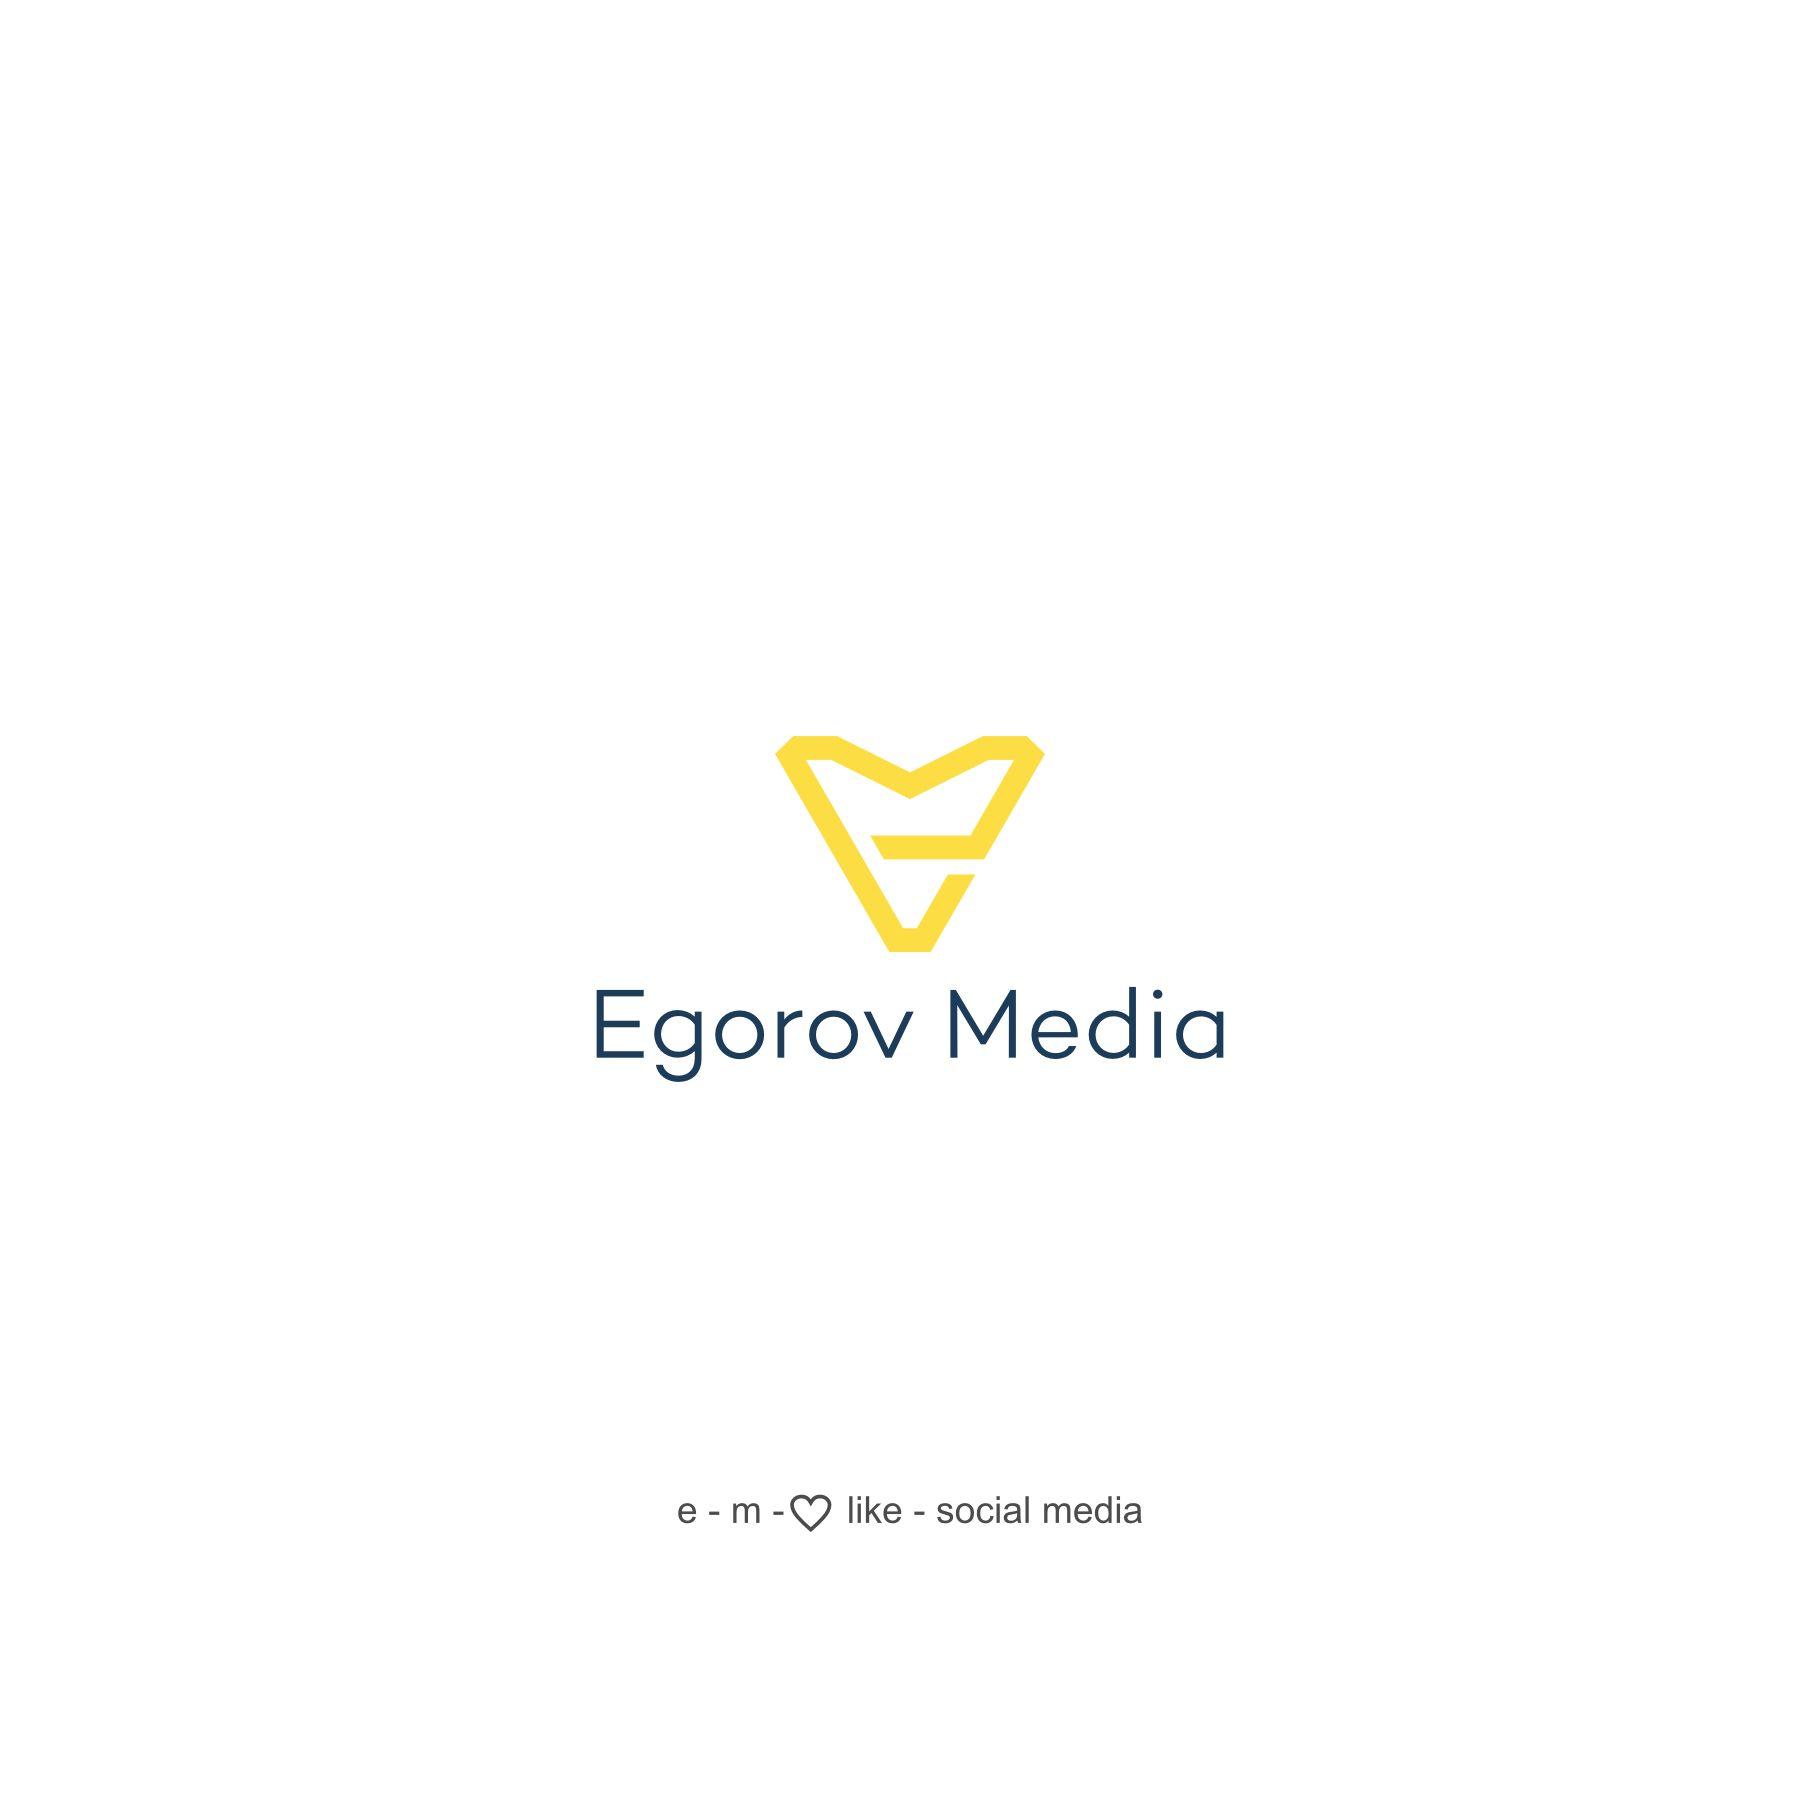 Логотип для Egorov Media - дизайнер zima